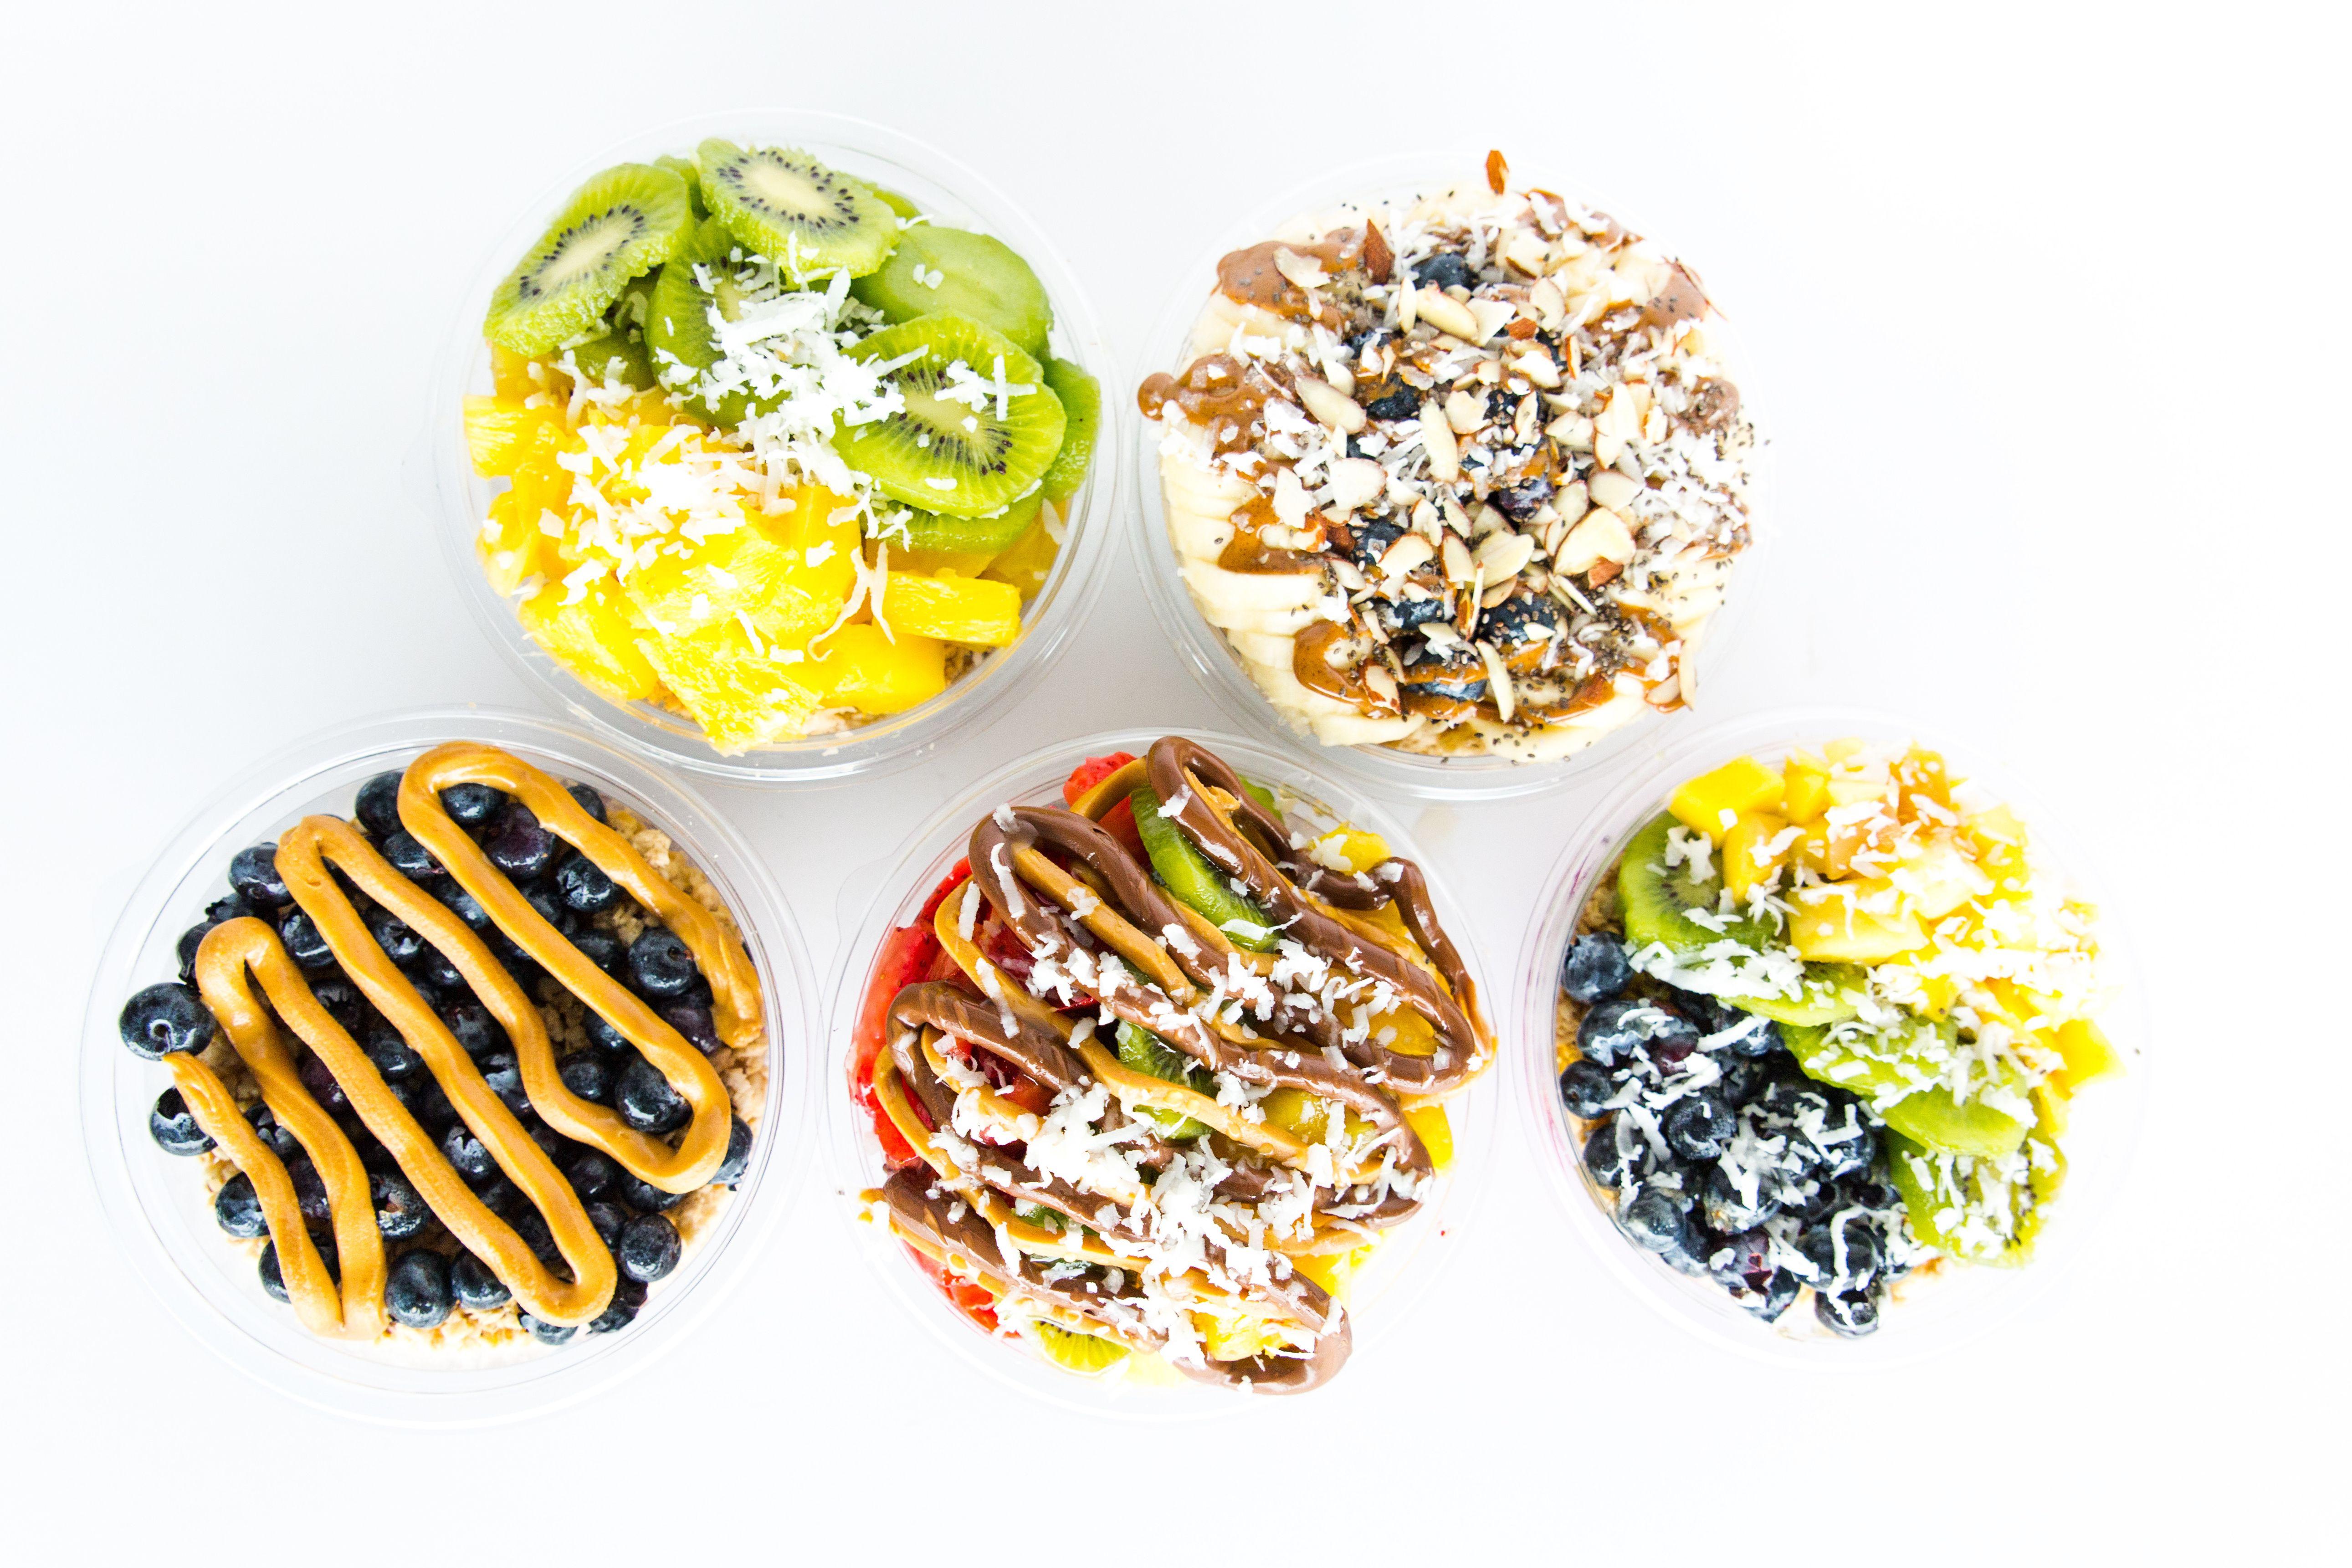 Frutta Bowls, Philadelphia's New Açaí and Smoothie Shop, Is